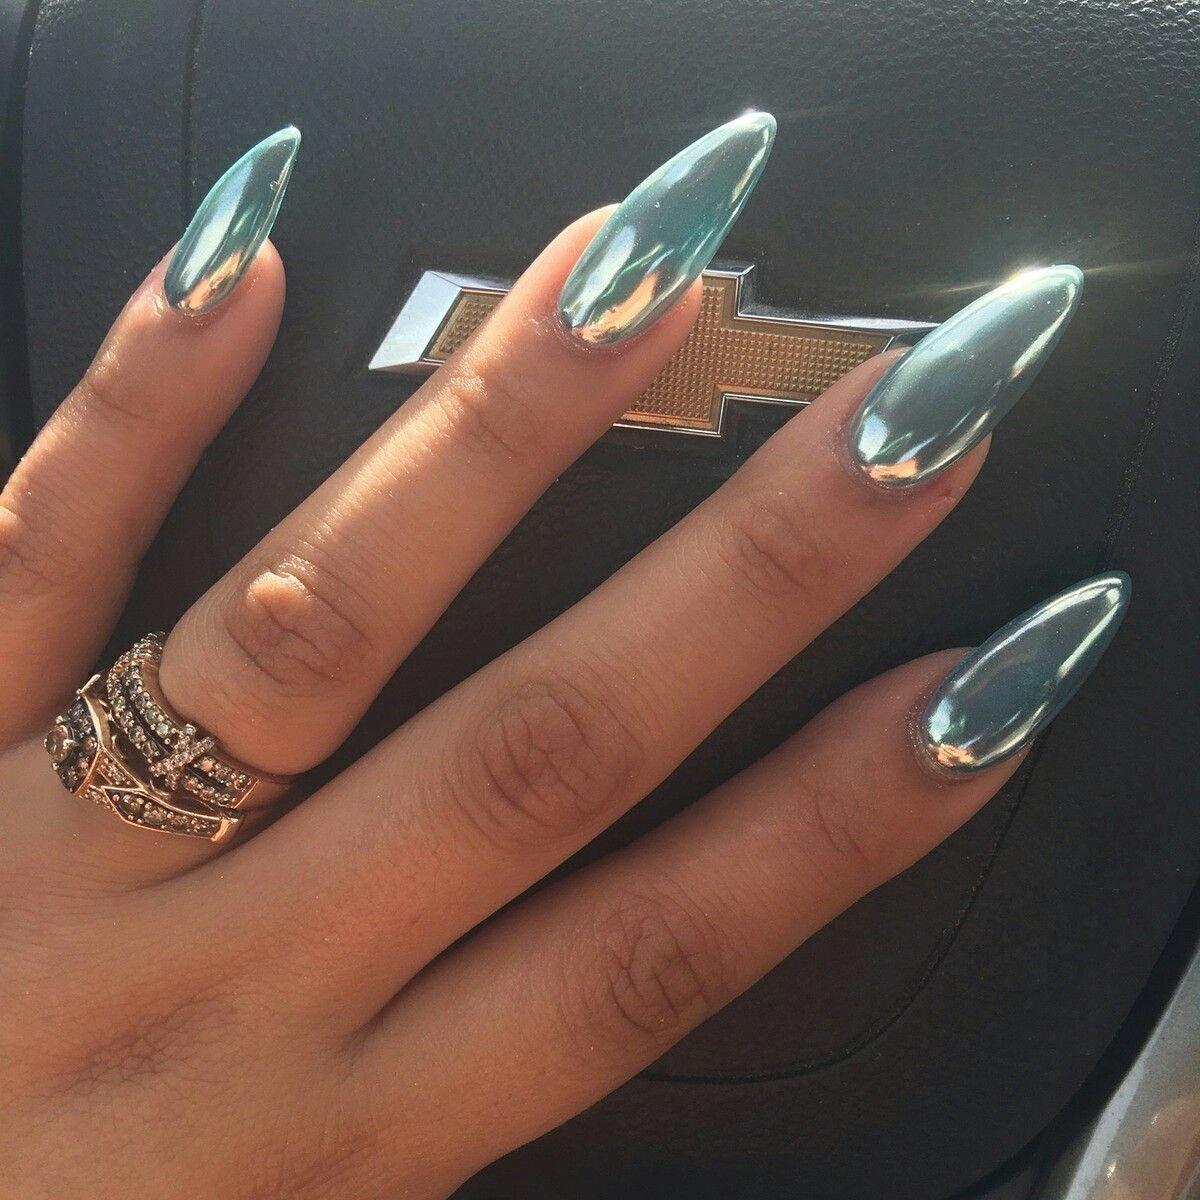 Маникюр 2018 фото новинки на длинные ногти